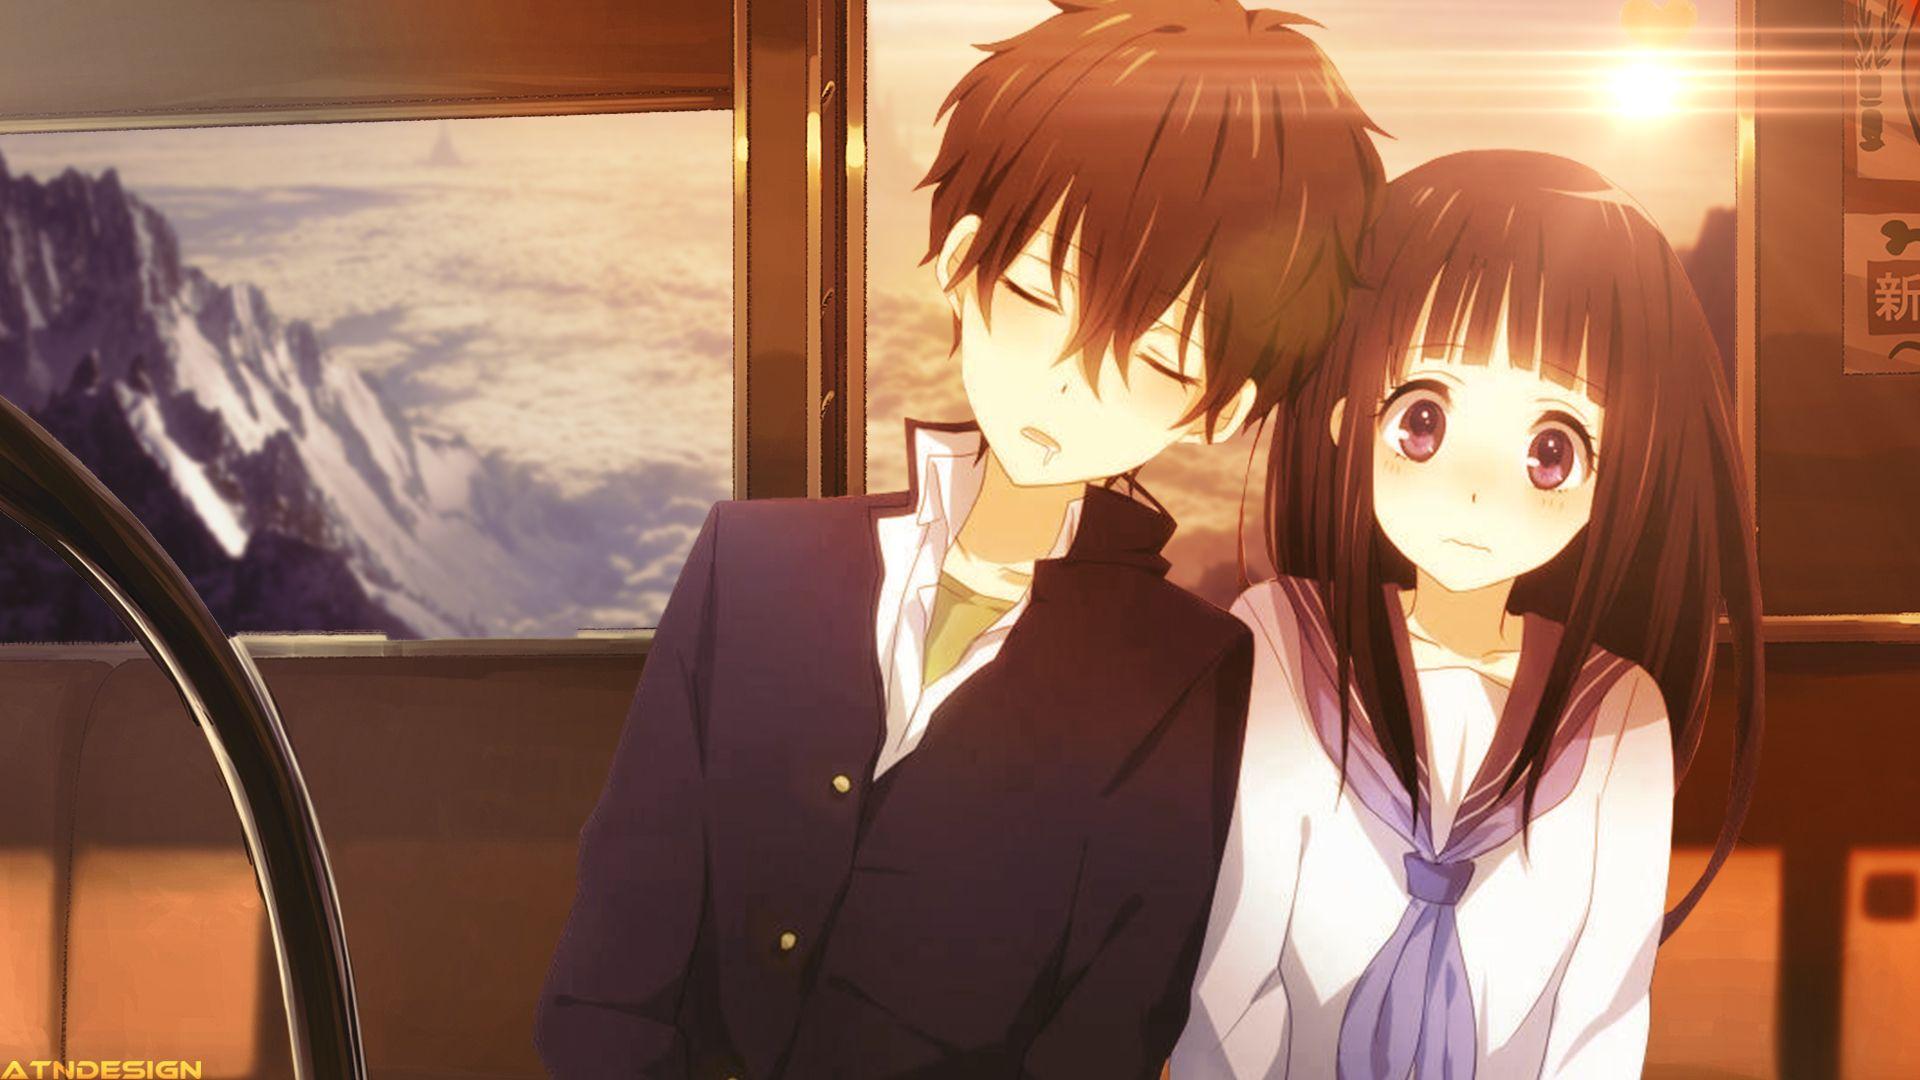 Cute anime couples wallpaper 1920x1080 75207